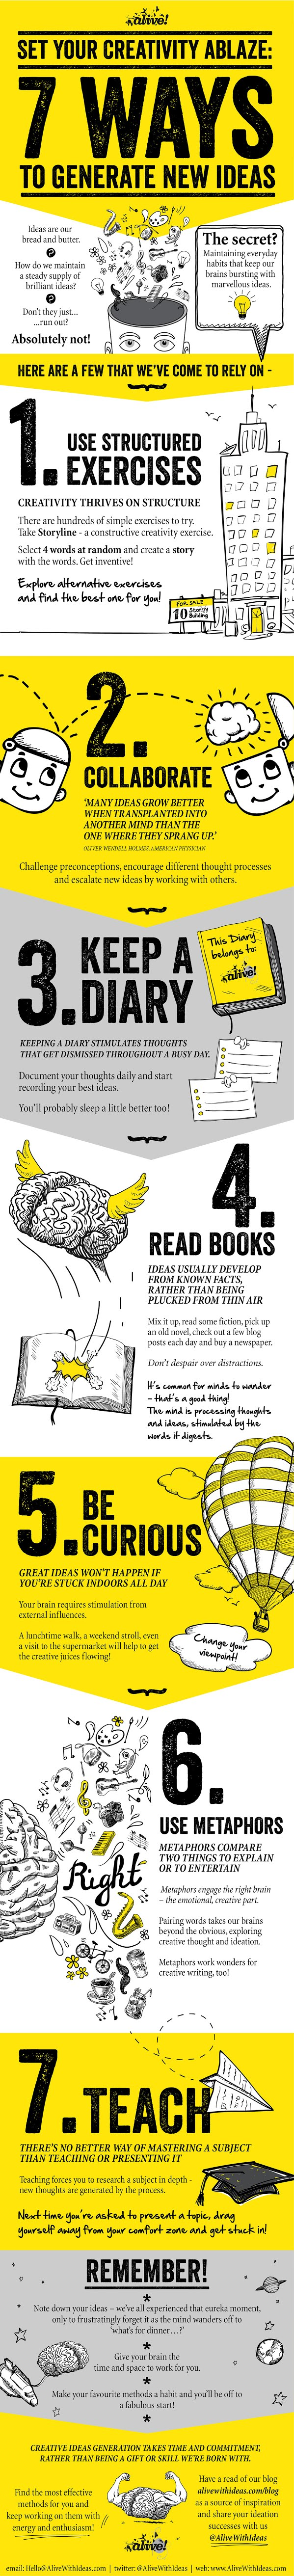 Set Your Creativity Ablaze! 7 Ways to Generate New Ideas #infographic